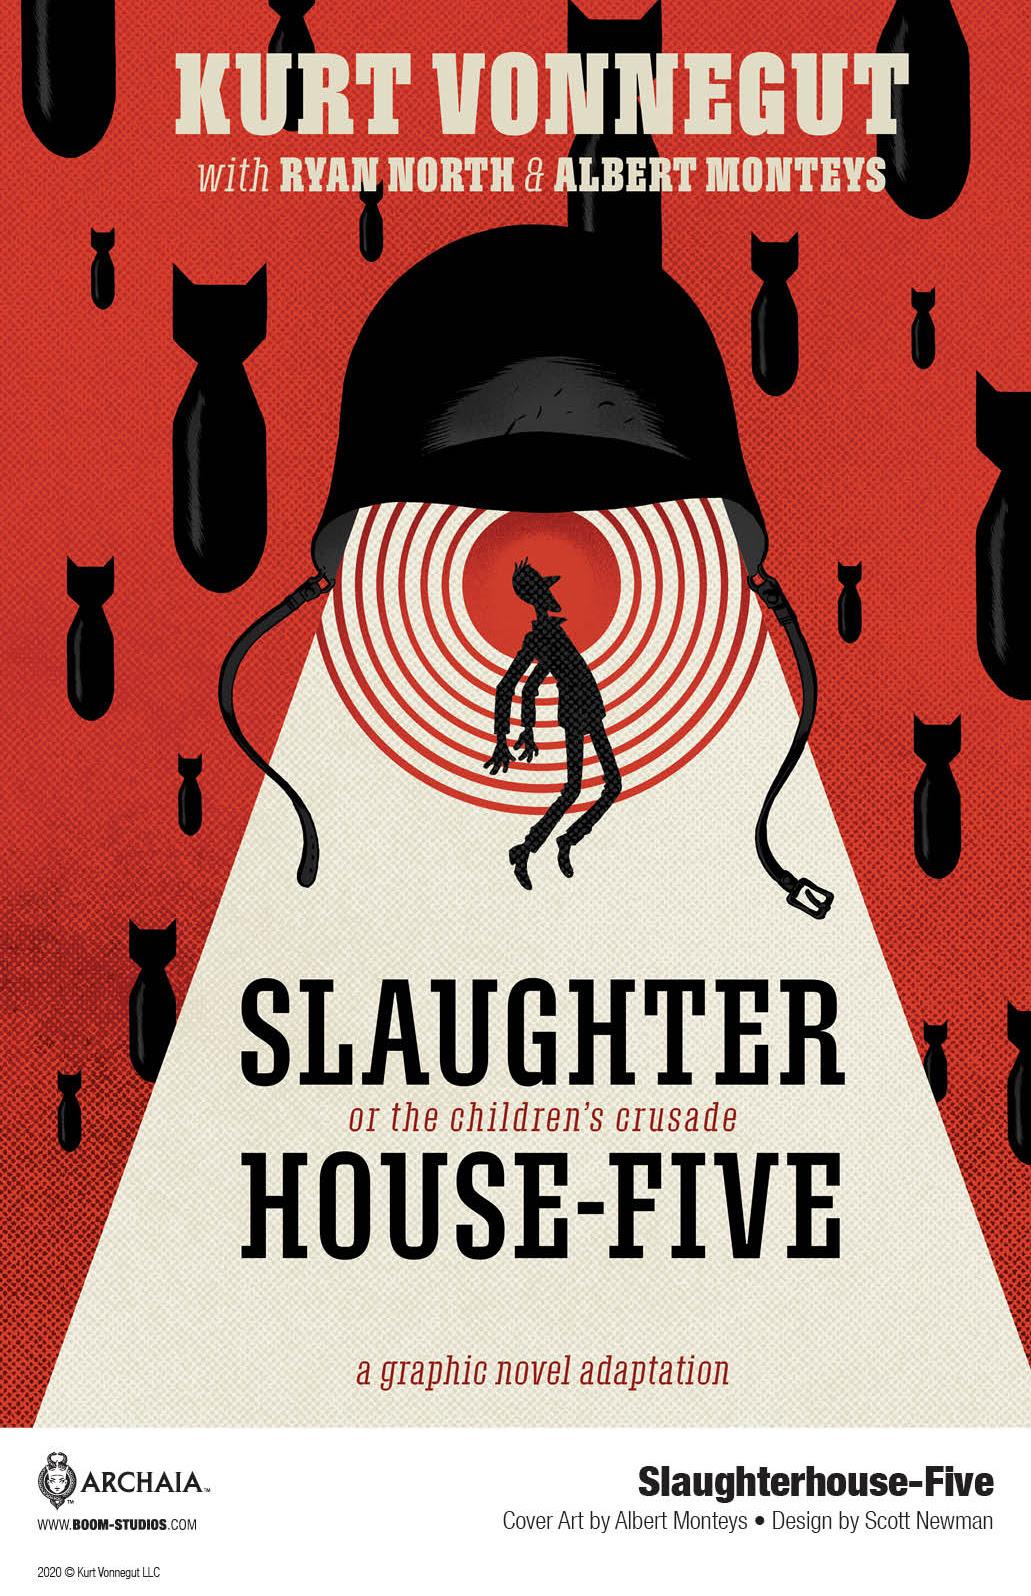 Slaughterhouse-Five OGN cover